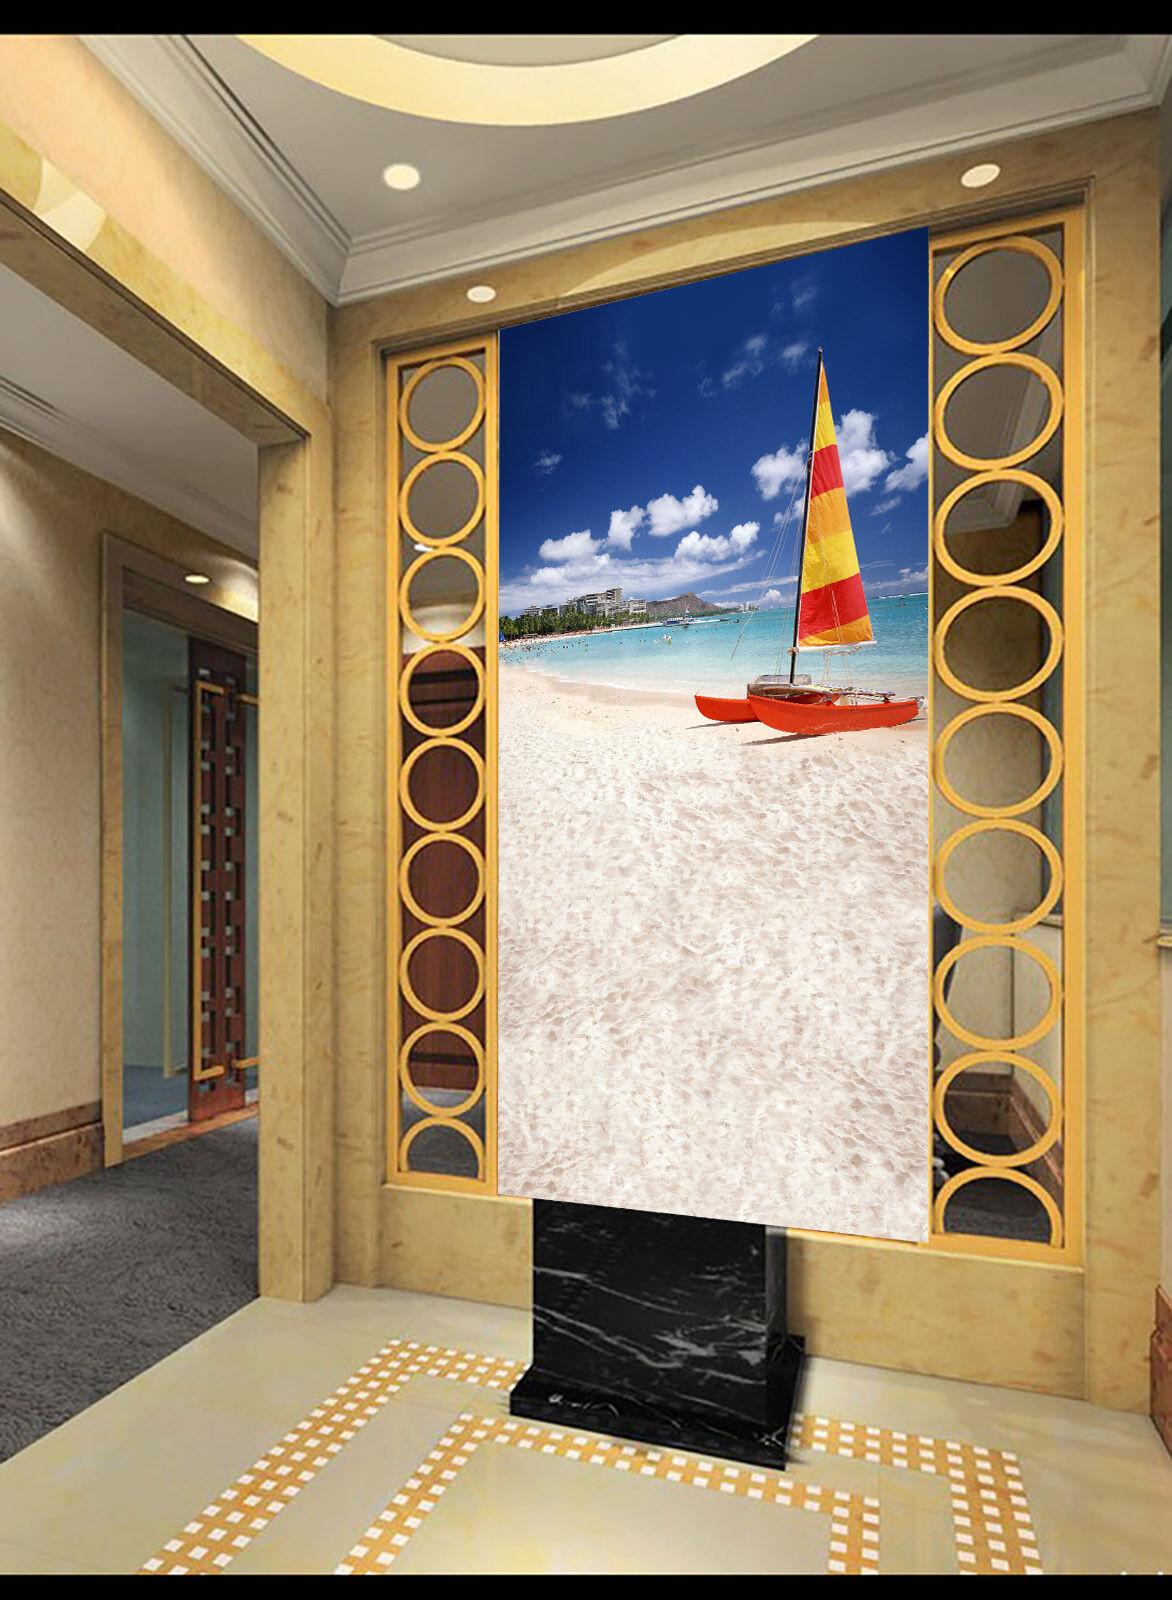 3D Segeln Segeln Segeln Strand 864 Tapete Wandgemälde Tapete Tapeten Bild Familie DE Summer | Verrückter Preis  | Zart  |  8bc7a1